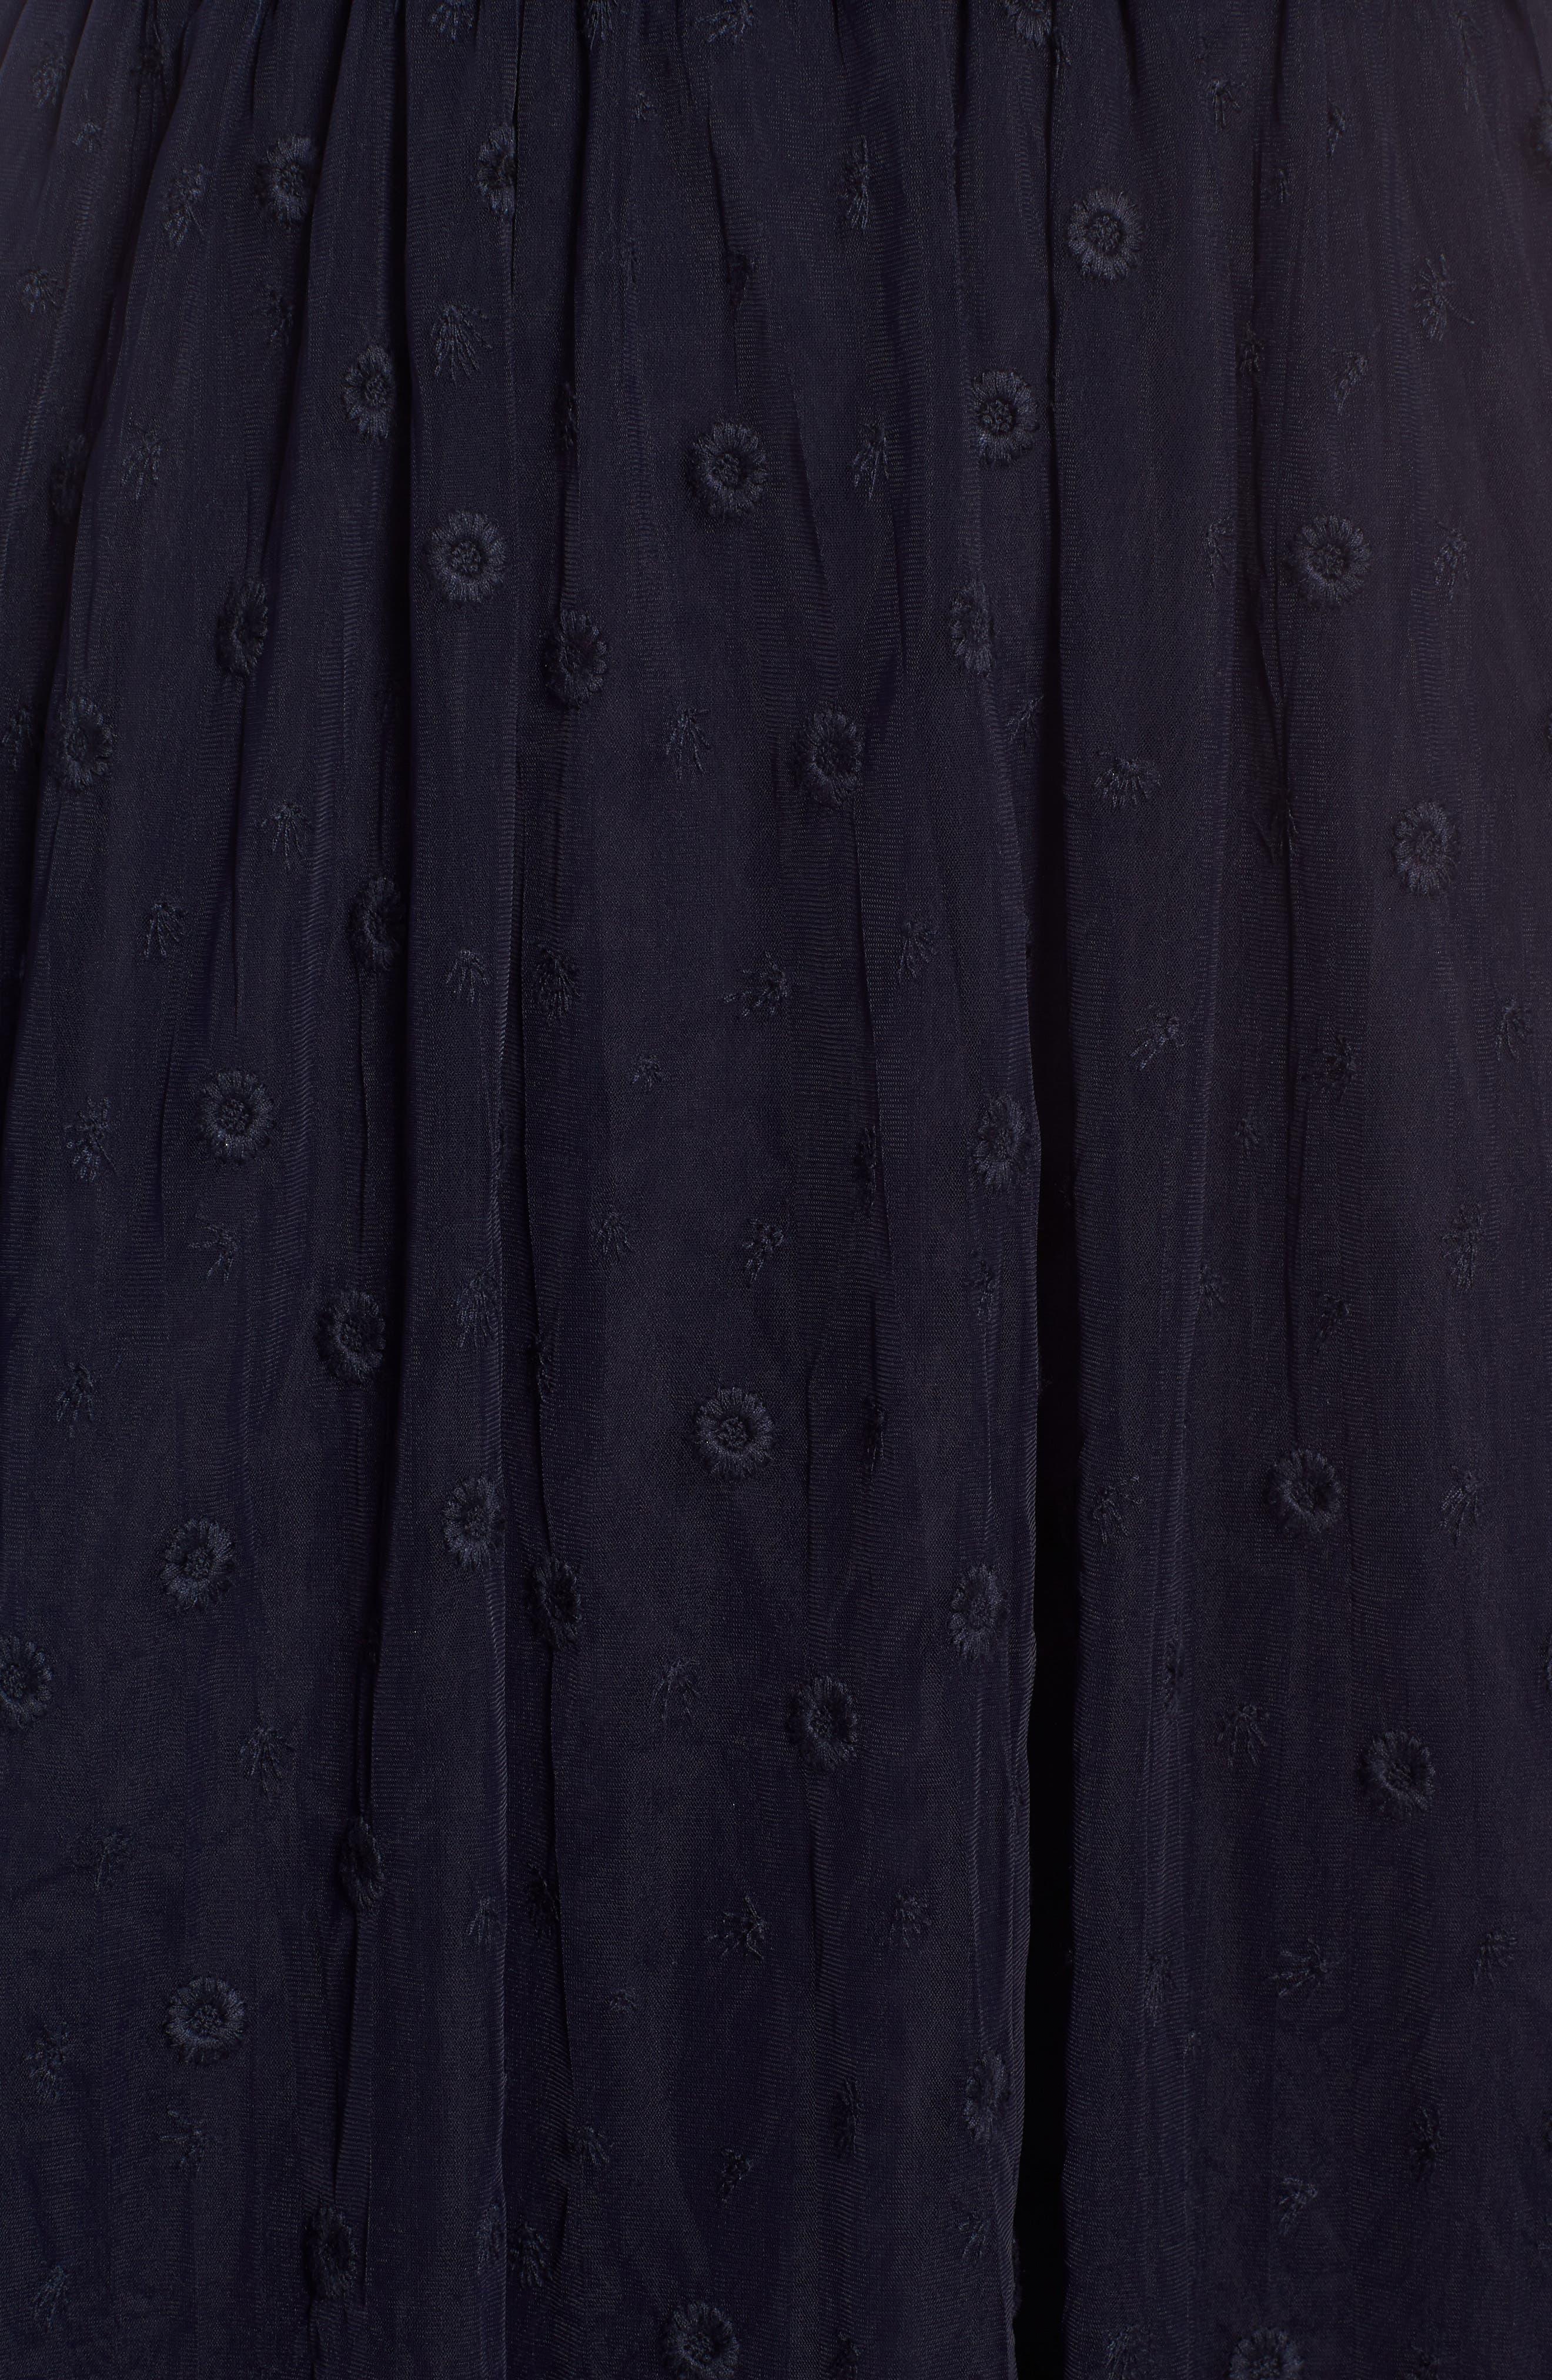 Embroidered Tulle Skirt,                             Alternate thumbnail 5, color,                             410